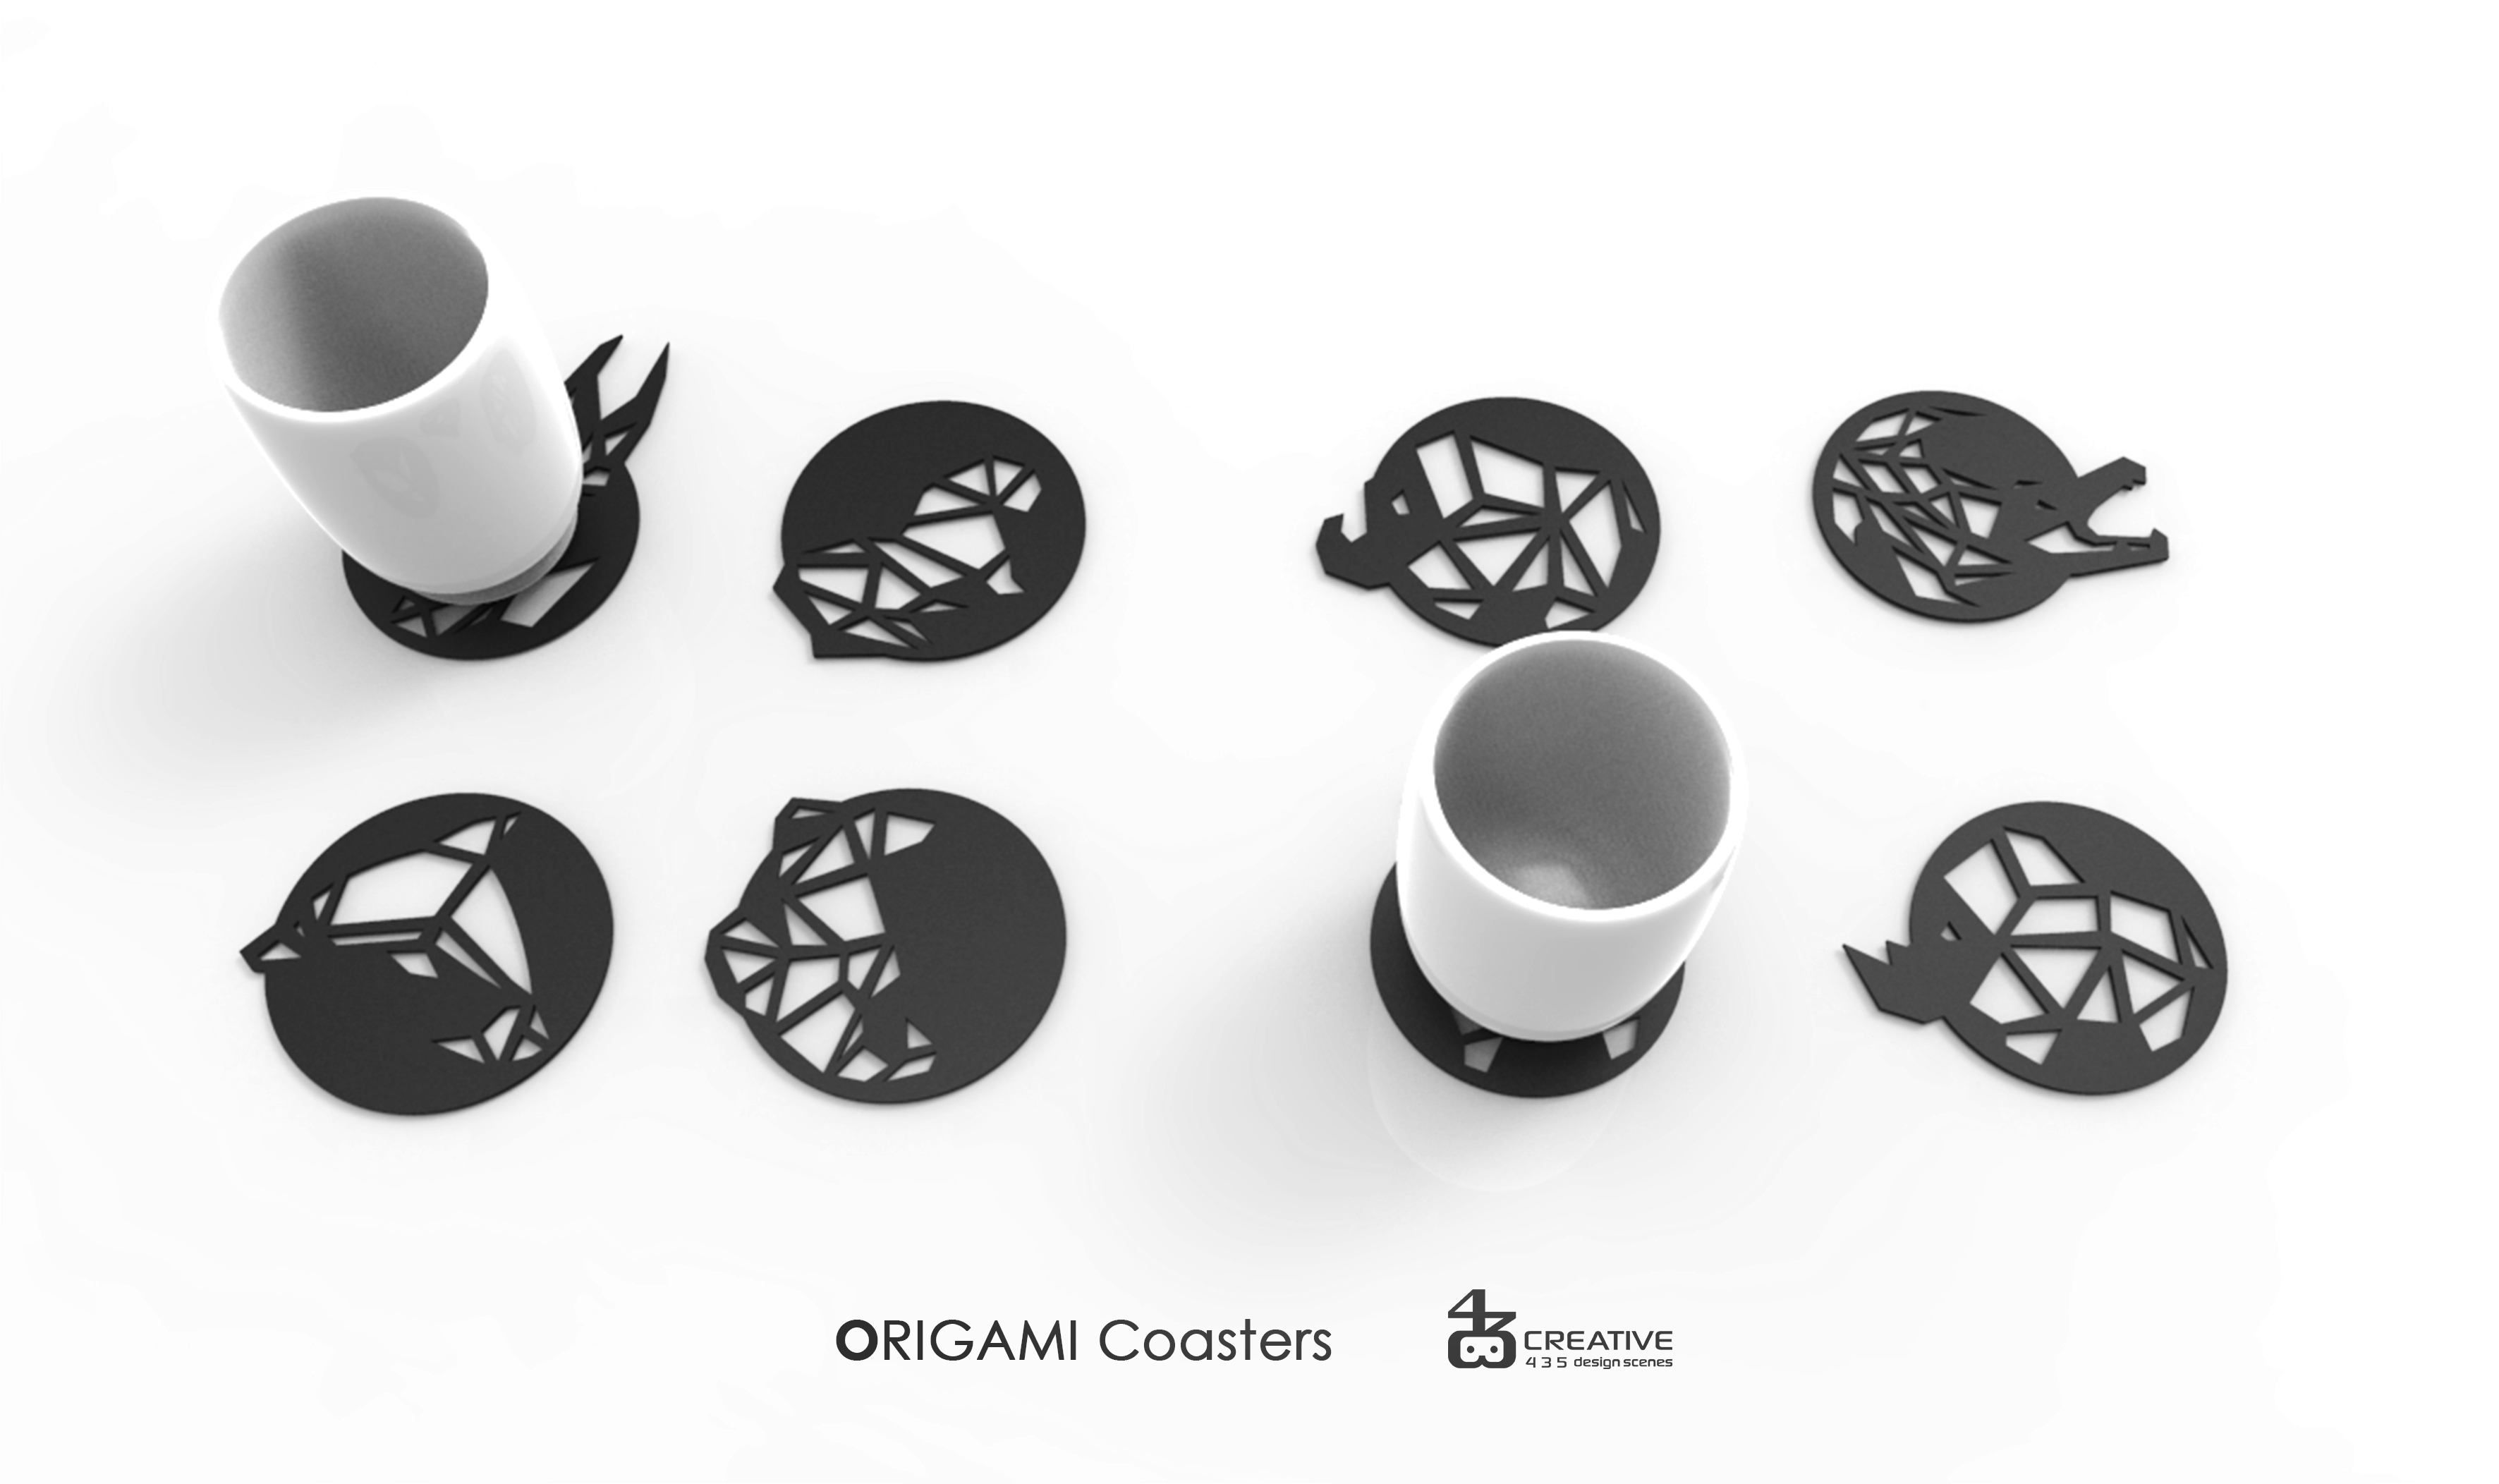 ORIGAMI_COASTERS_002